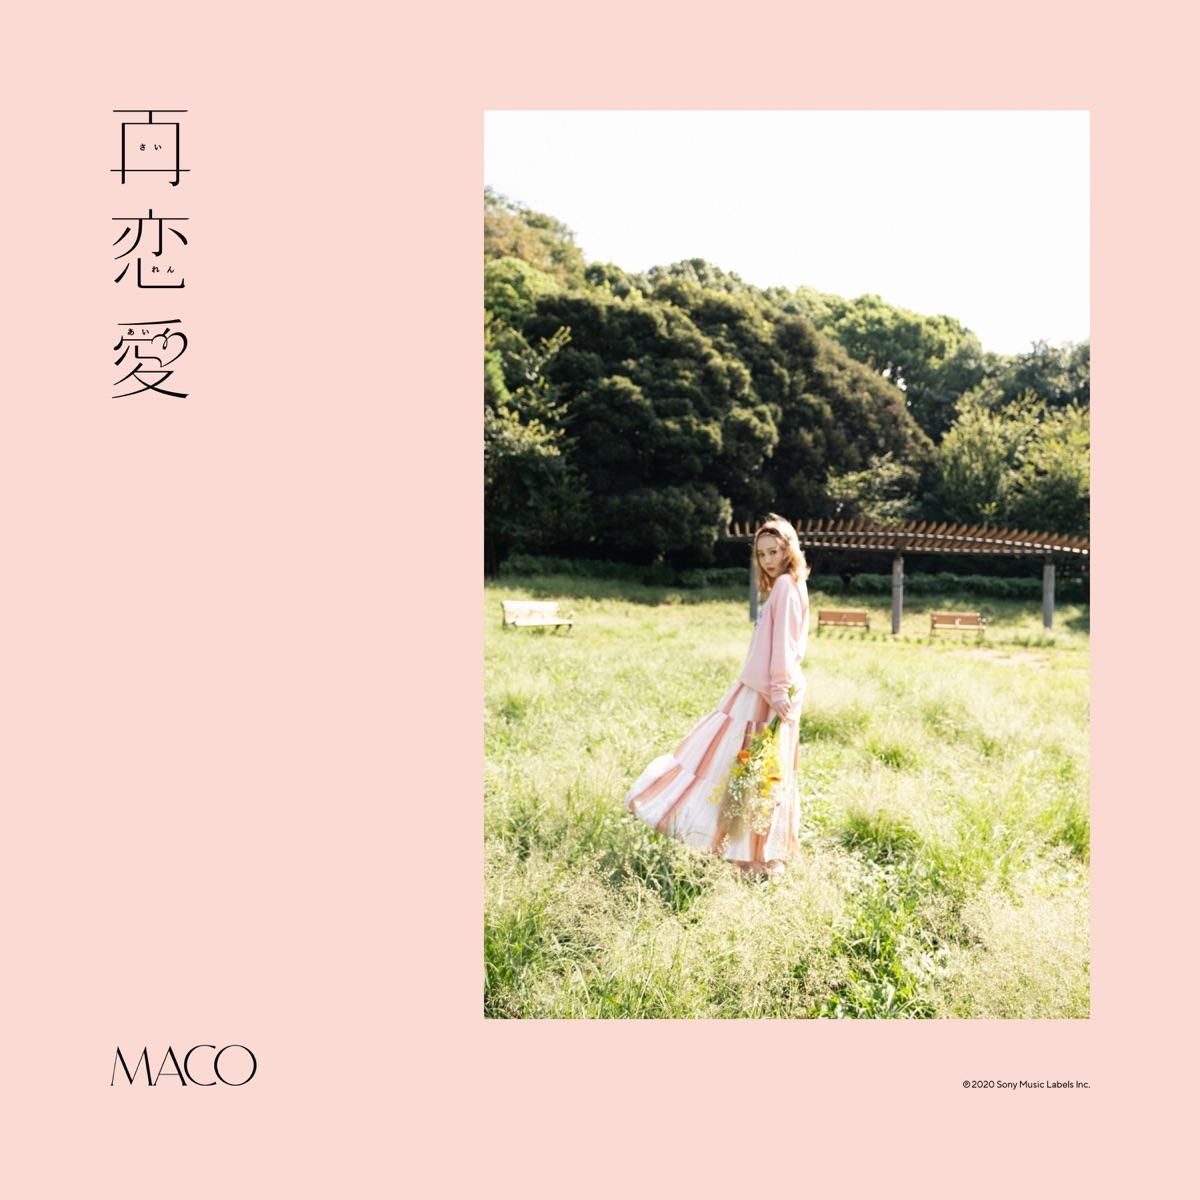 『MACO - 再恋愛』収録の『再恋愛』ジャケット